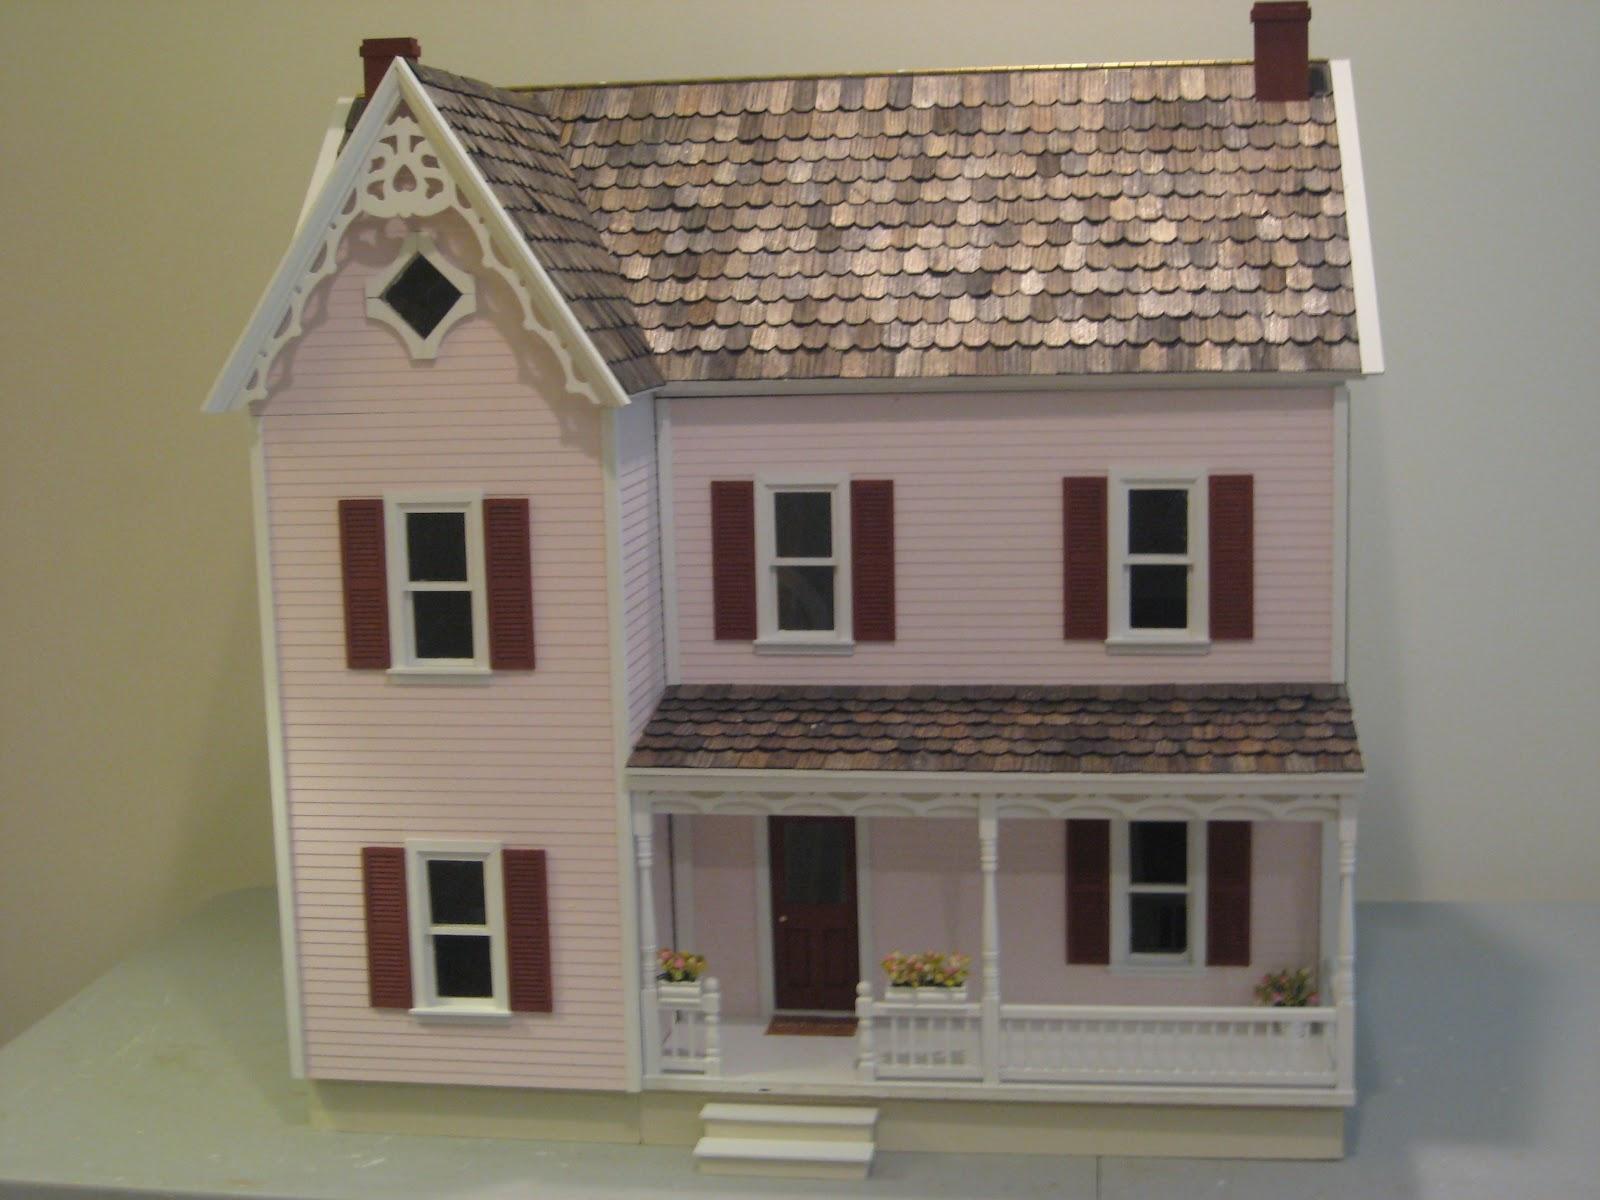 Victoria S Farmhouse Dollhouse Assembled Little Darlings